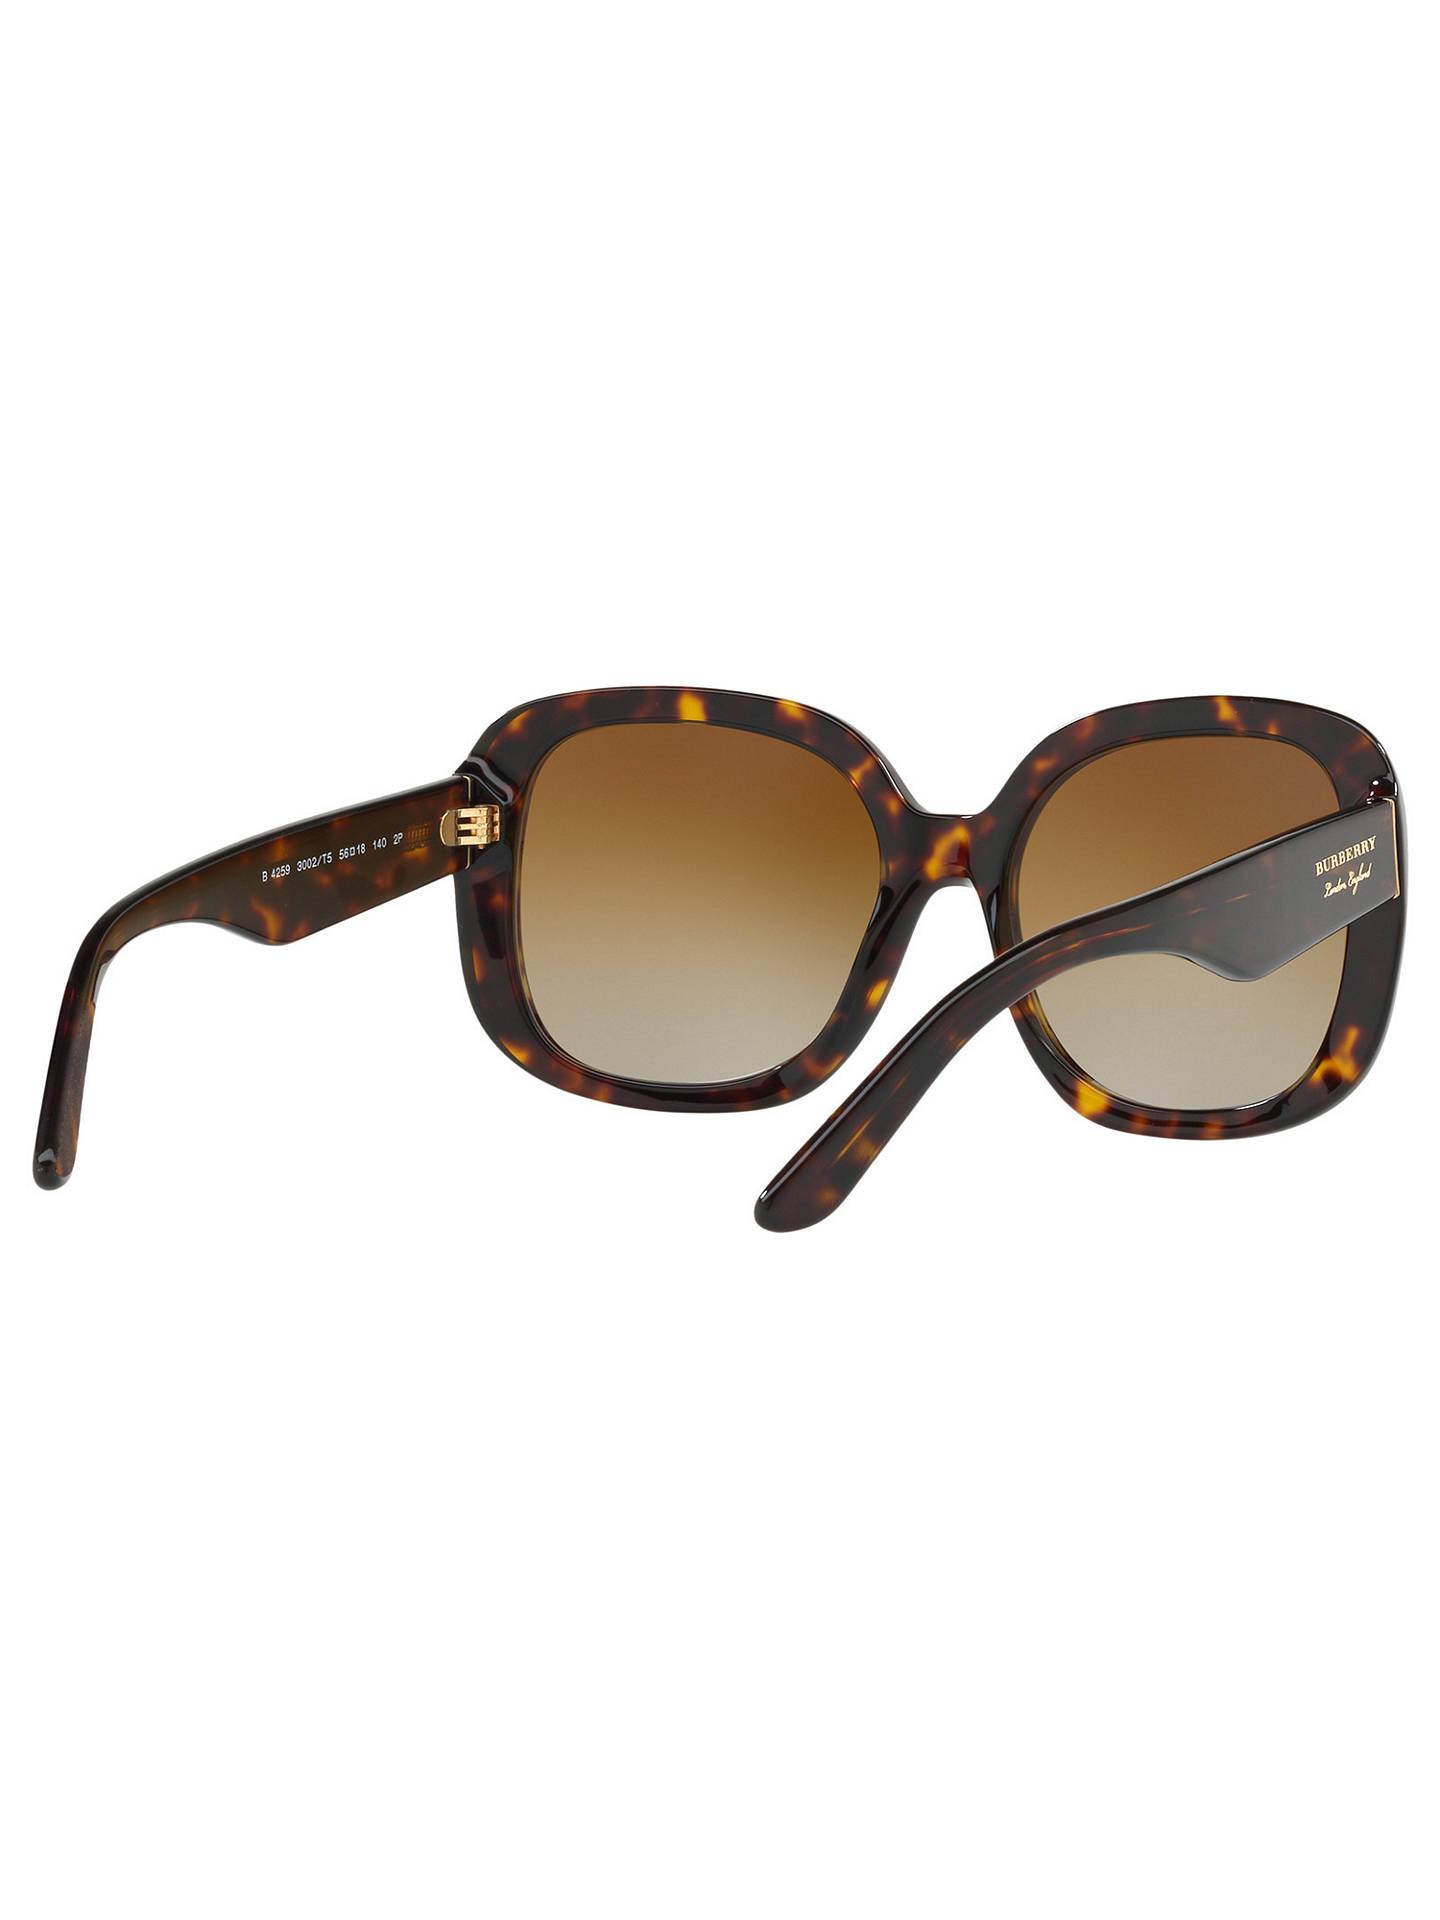 9b1bd12b36d2 ... Buy Burberry BE4259 Polarised Square Sunglasses, Tortoise/Brown  Gradient Online at johnlewis.com ...